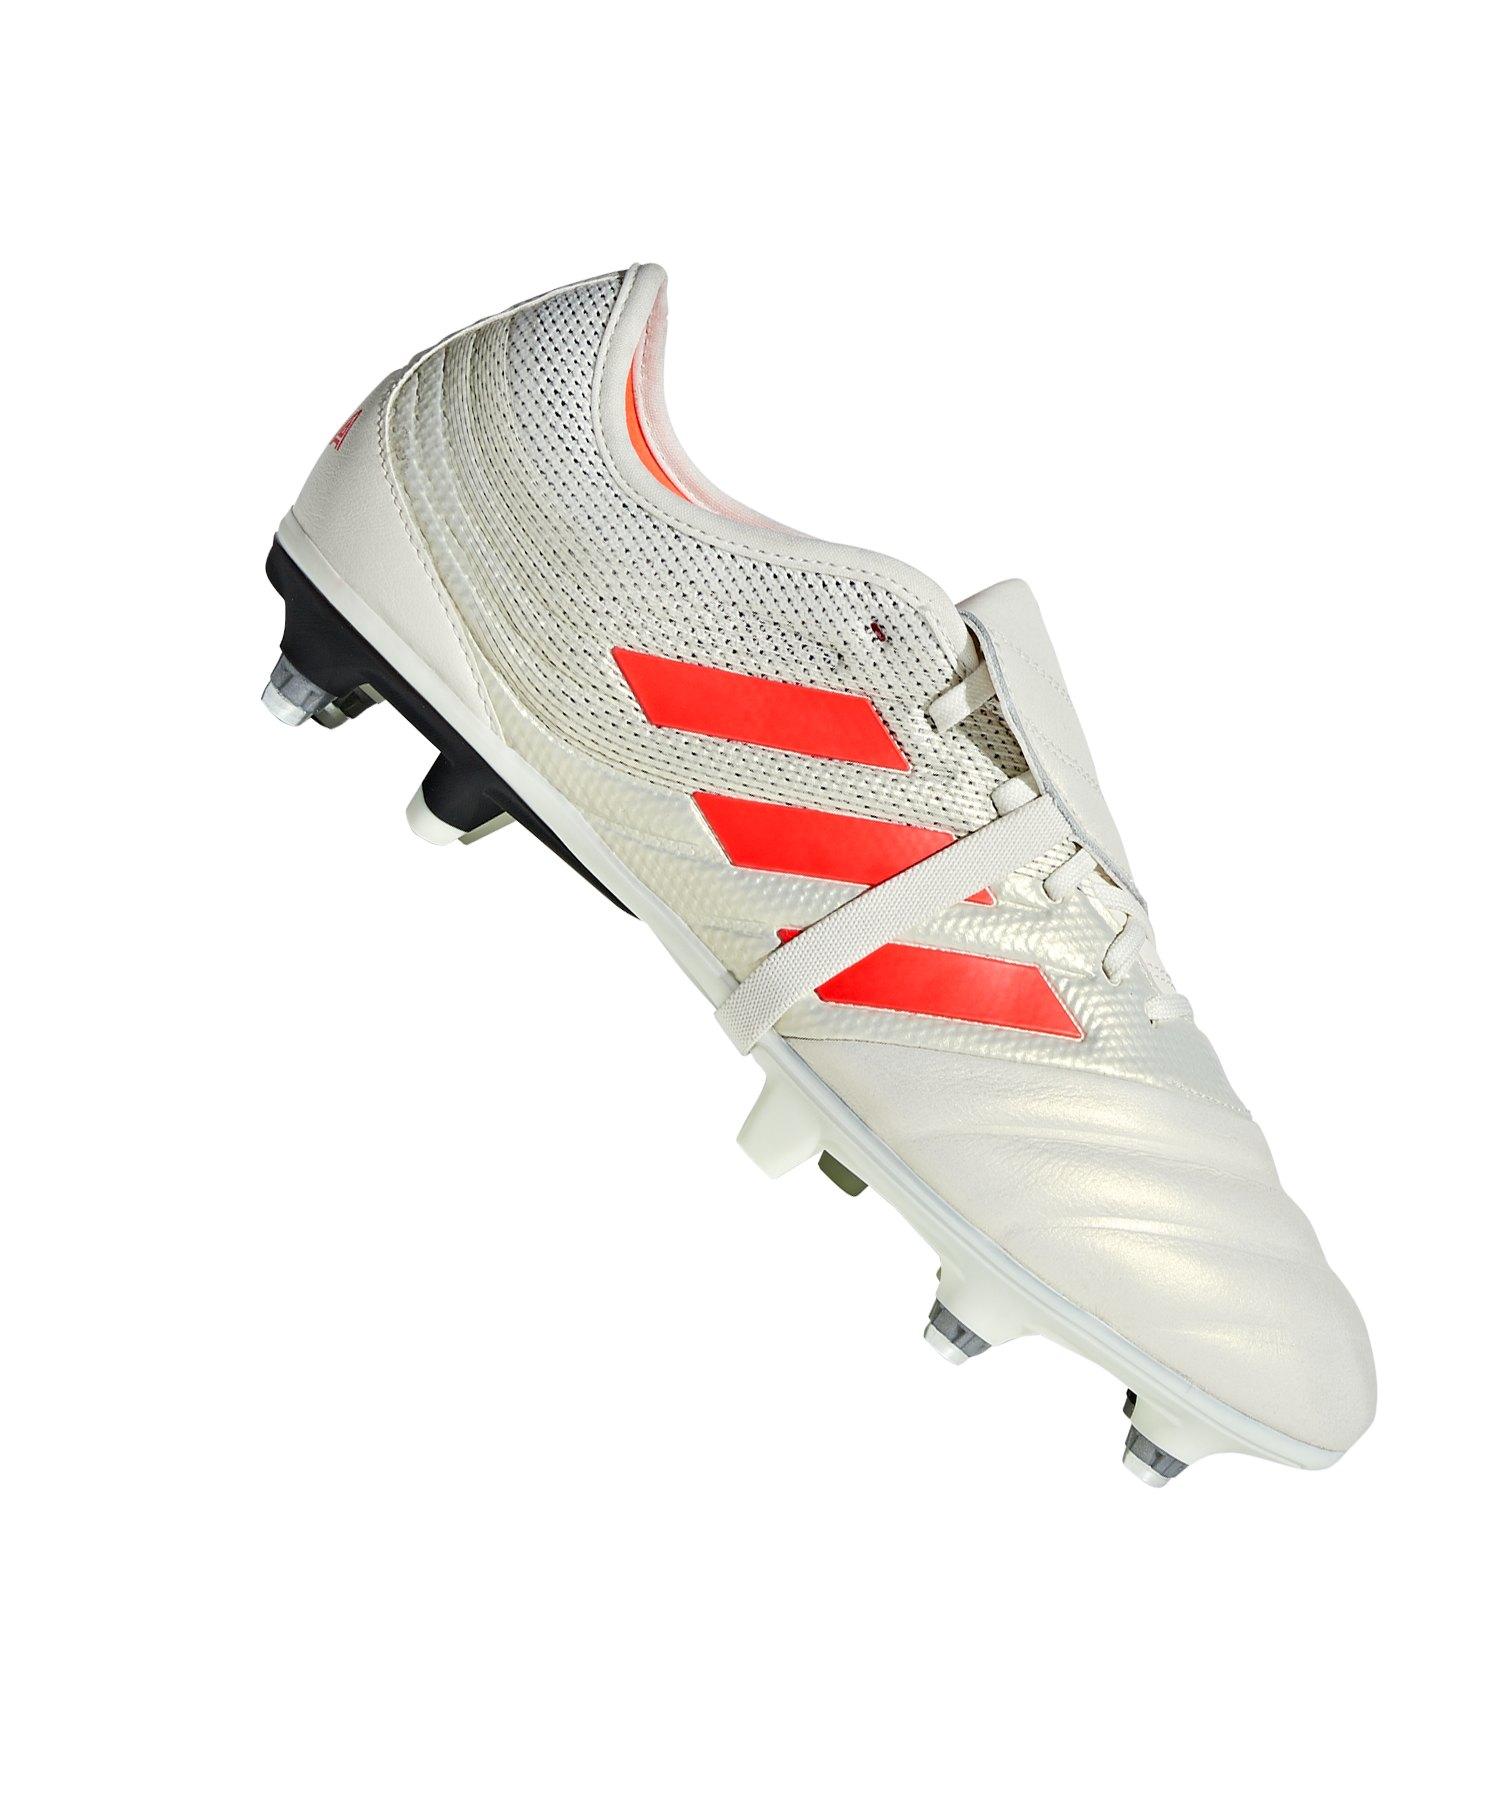 adidas COPA Gloro 19.2 SG Weiss Rot - weiss